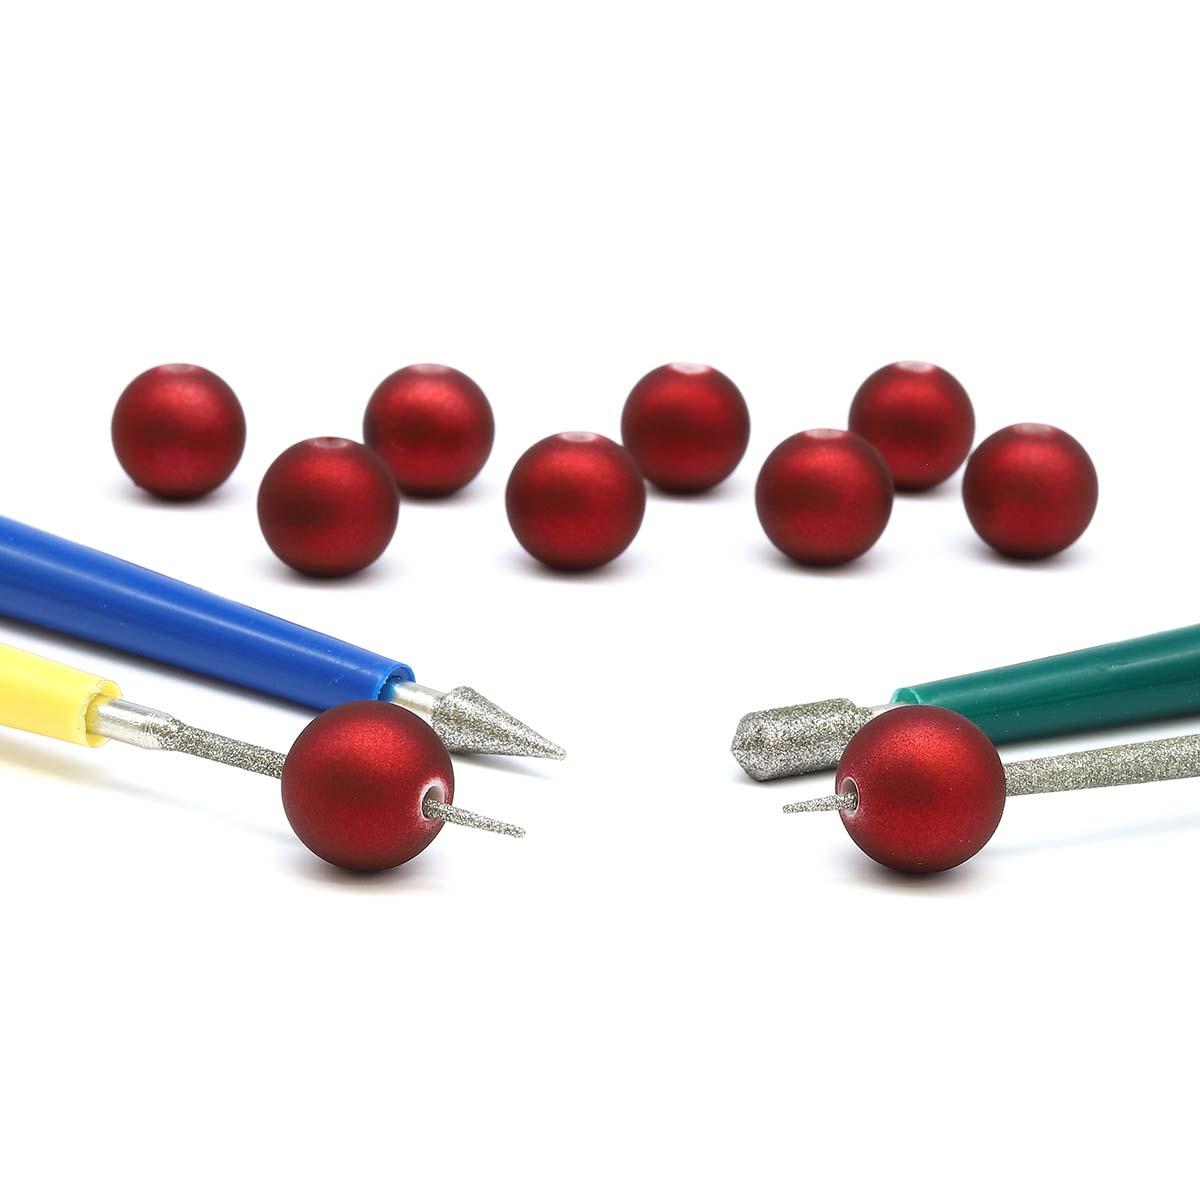 XQ017 Набор расширителей для бусин, 4 шт, Астра